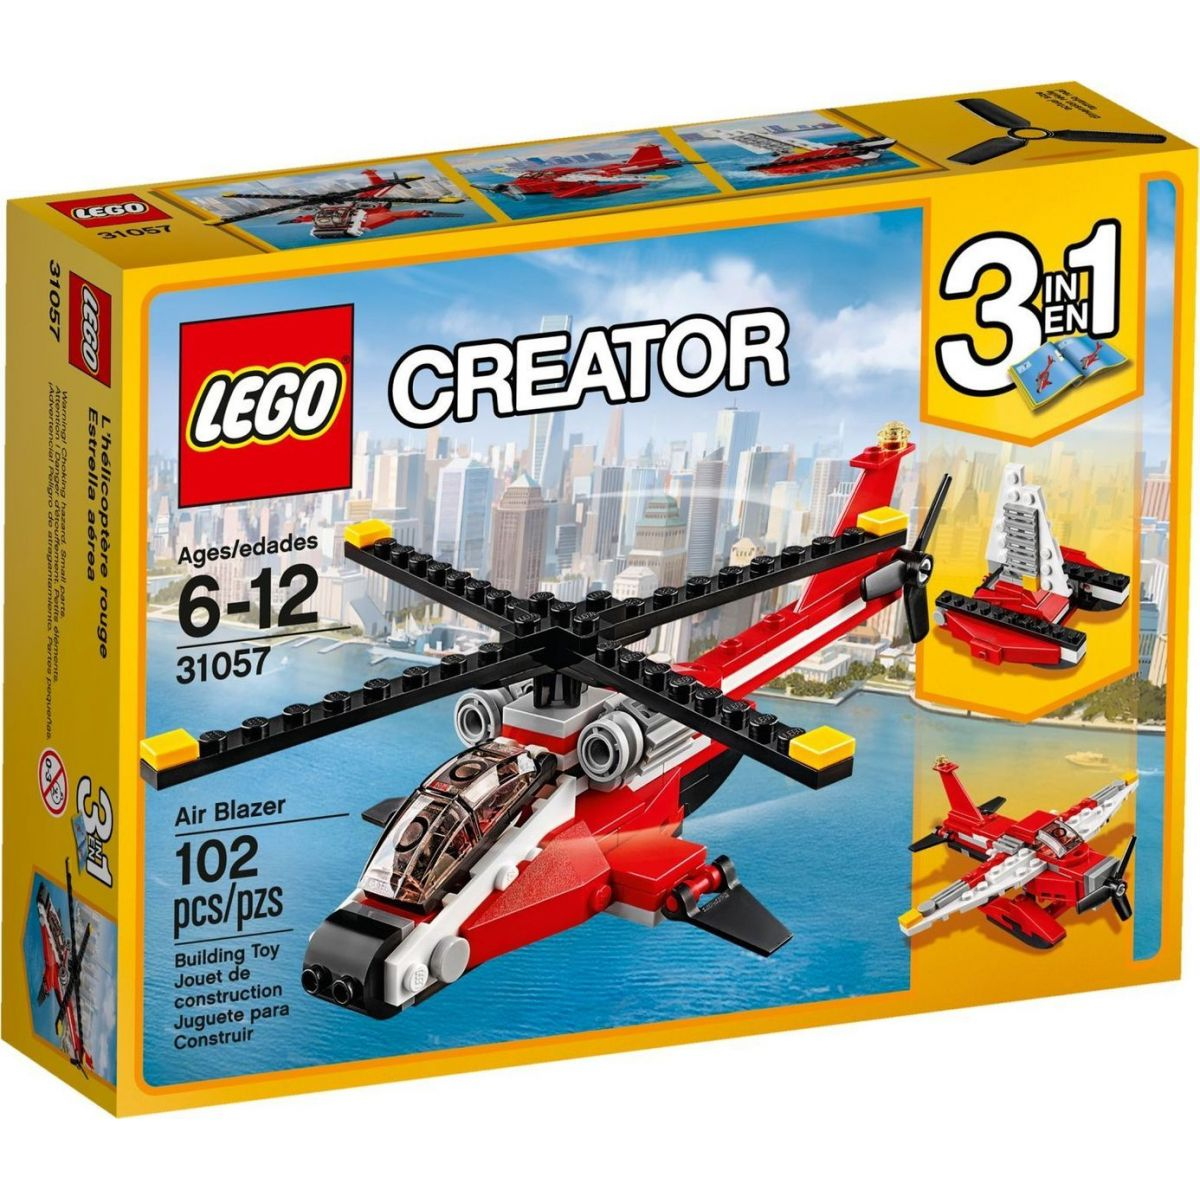 LEGO Creator 31057 Prieskumná helikoptéra - Poškozený obal